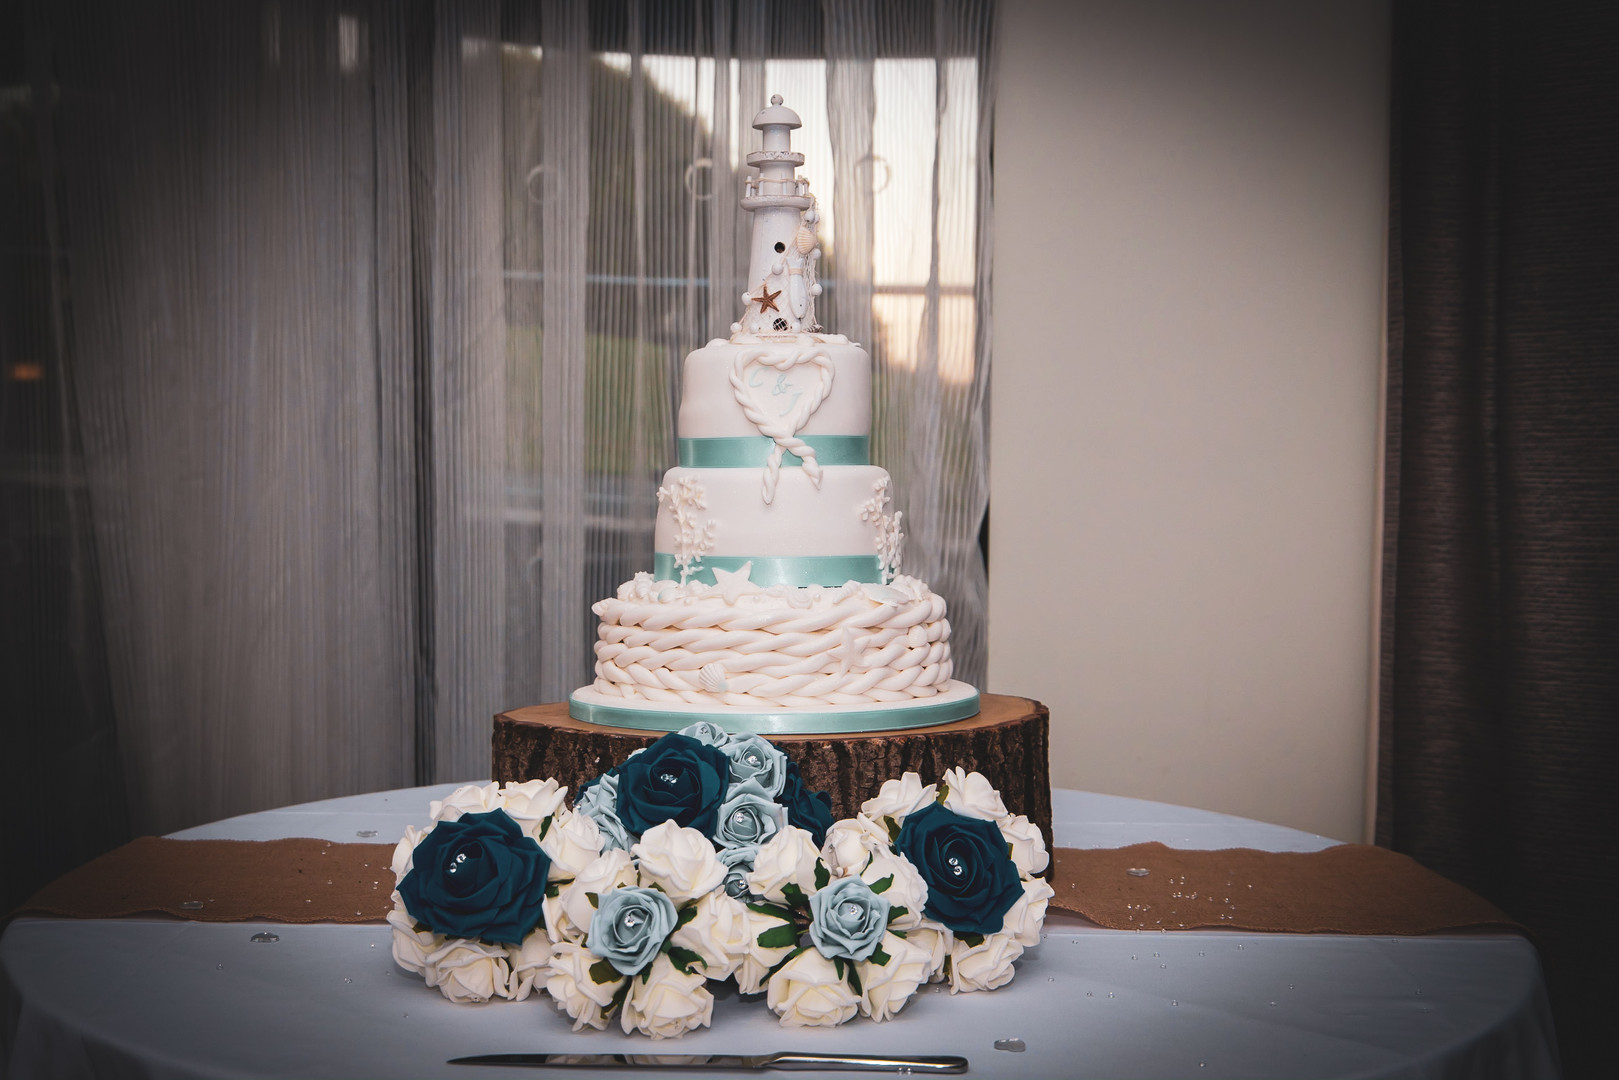 Jessica And Chris - The Wedding Cake